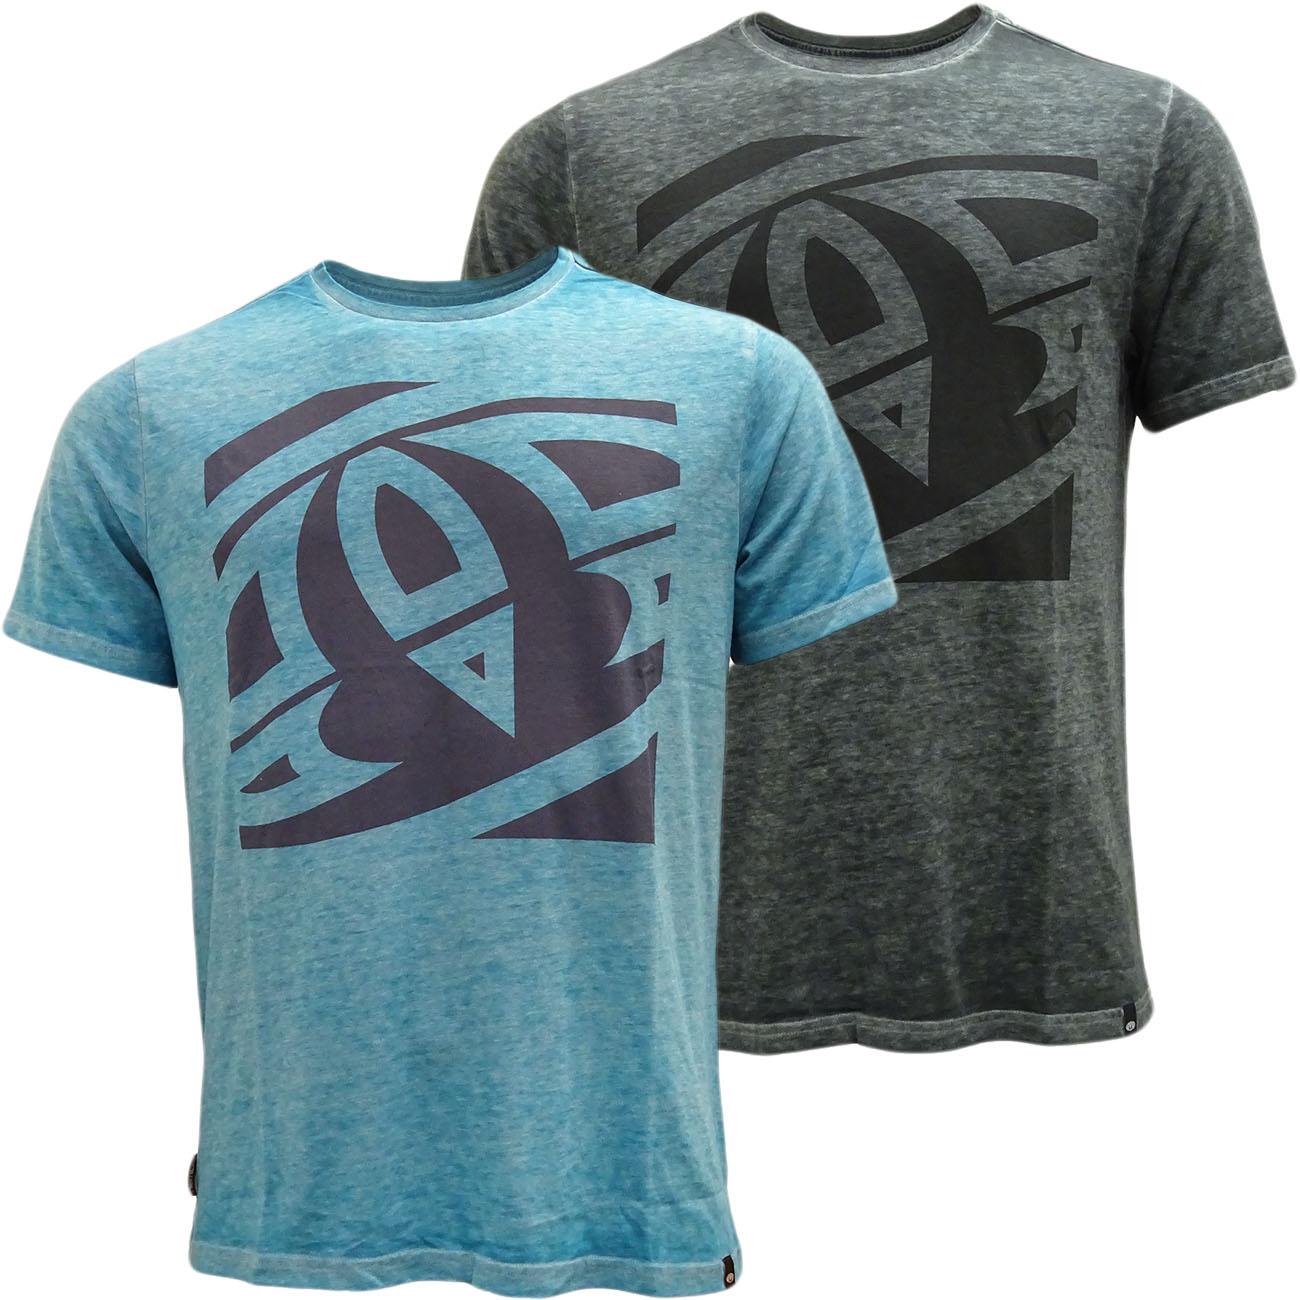 Mens Animal T Shirt Fadded Dye Effect- Regular Fit